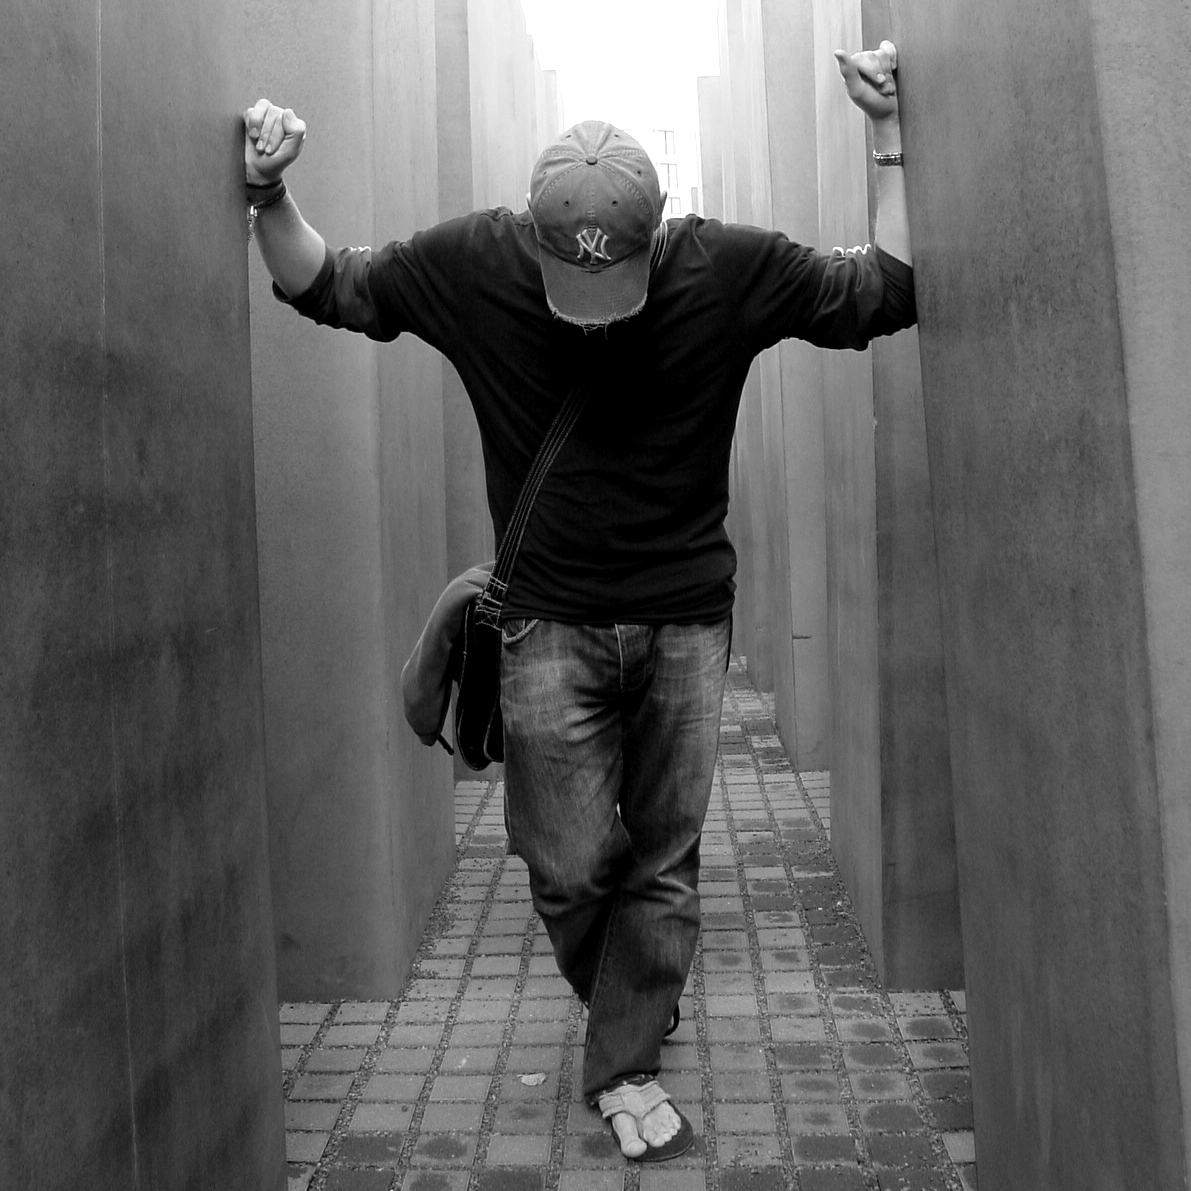 Matthew Teismann - Principalmteismann@lionarchitecture.com